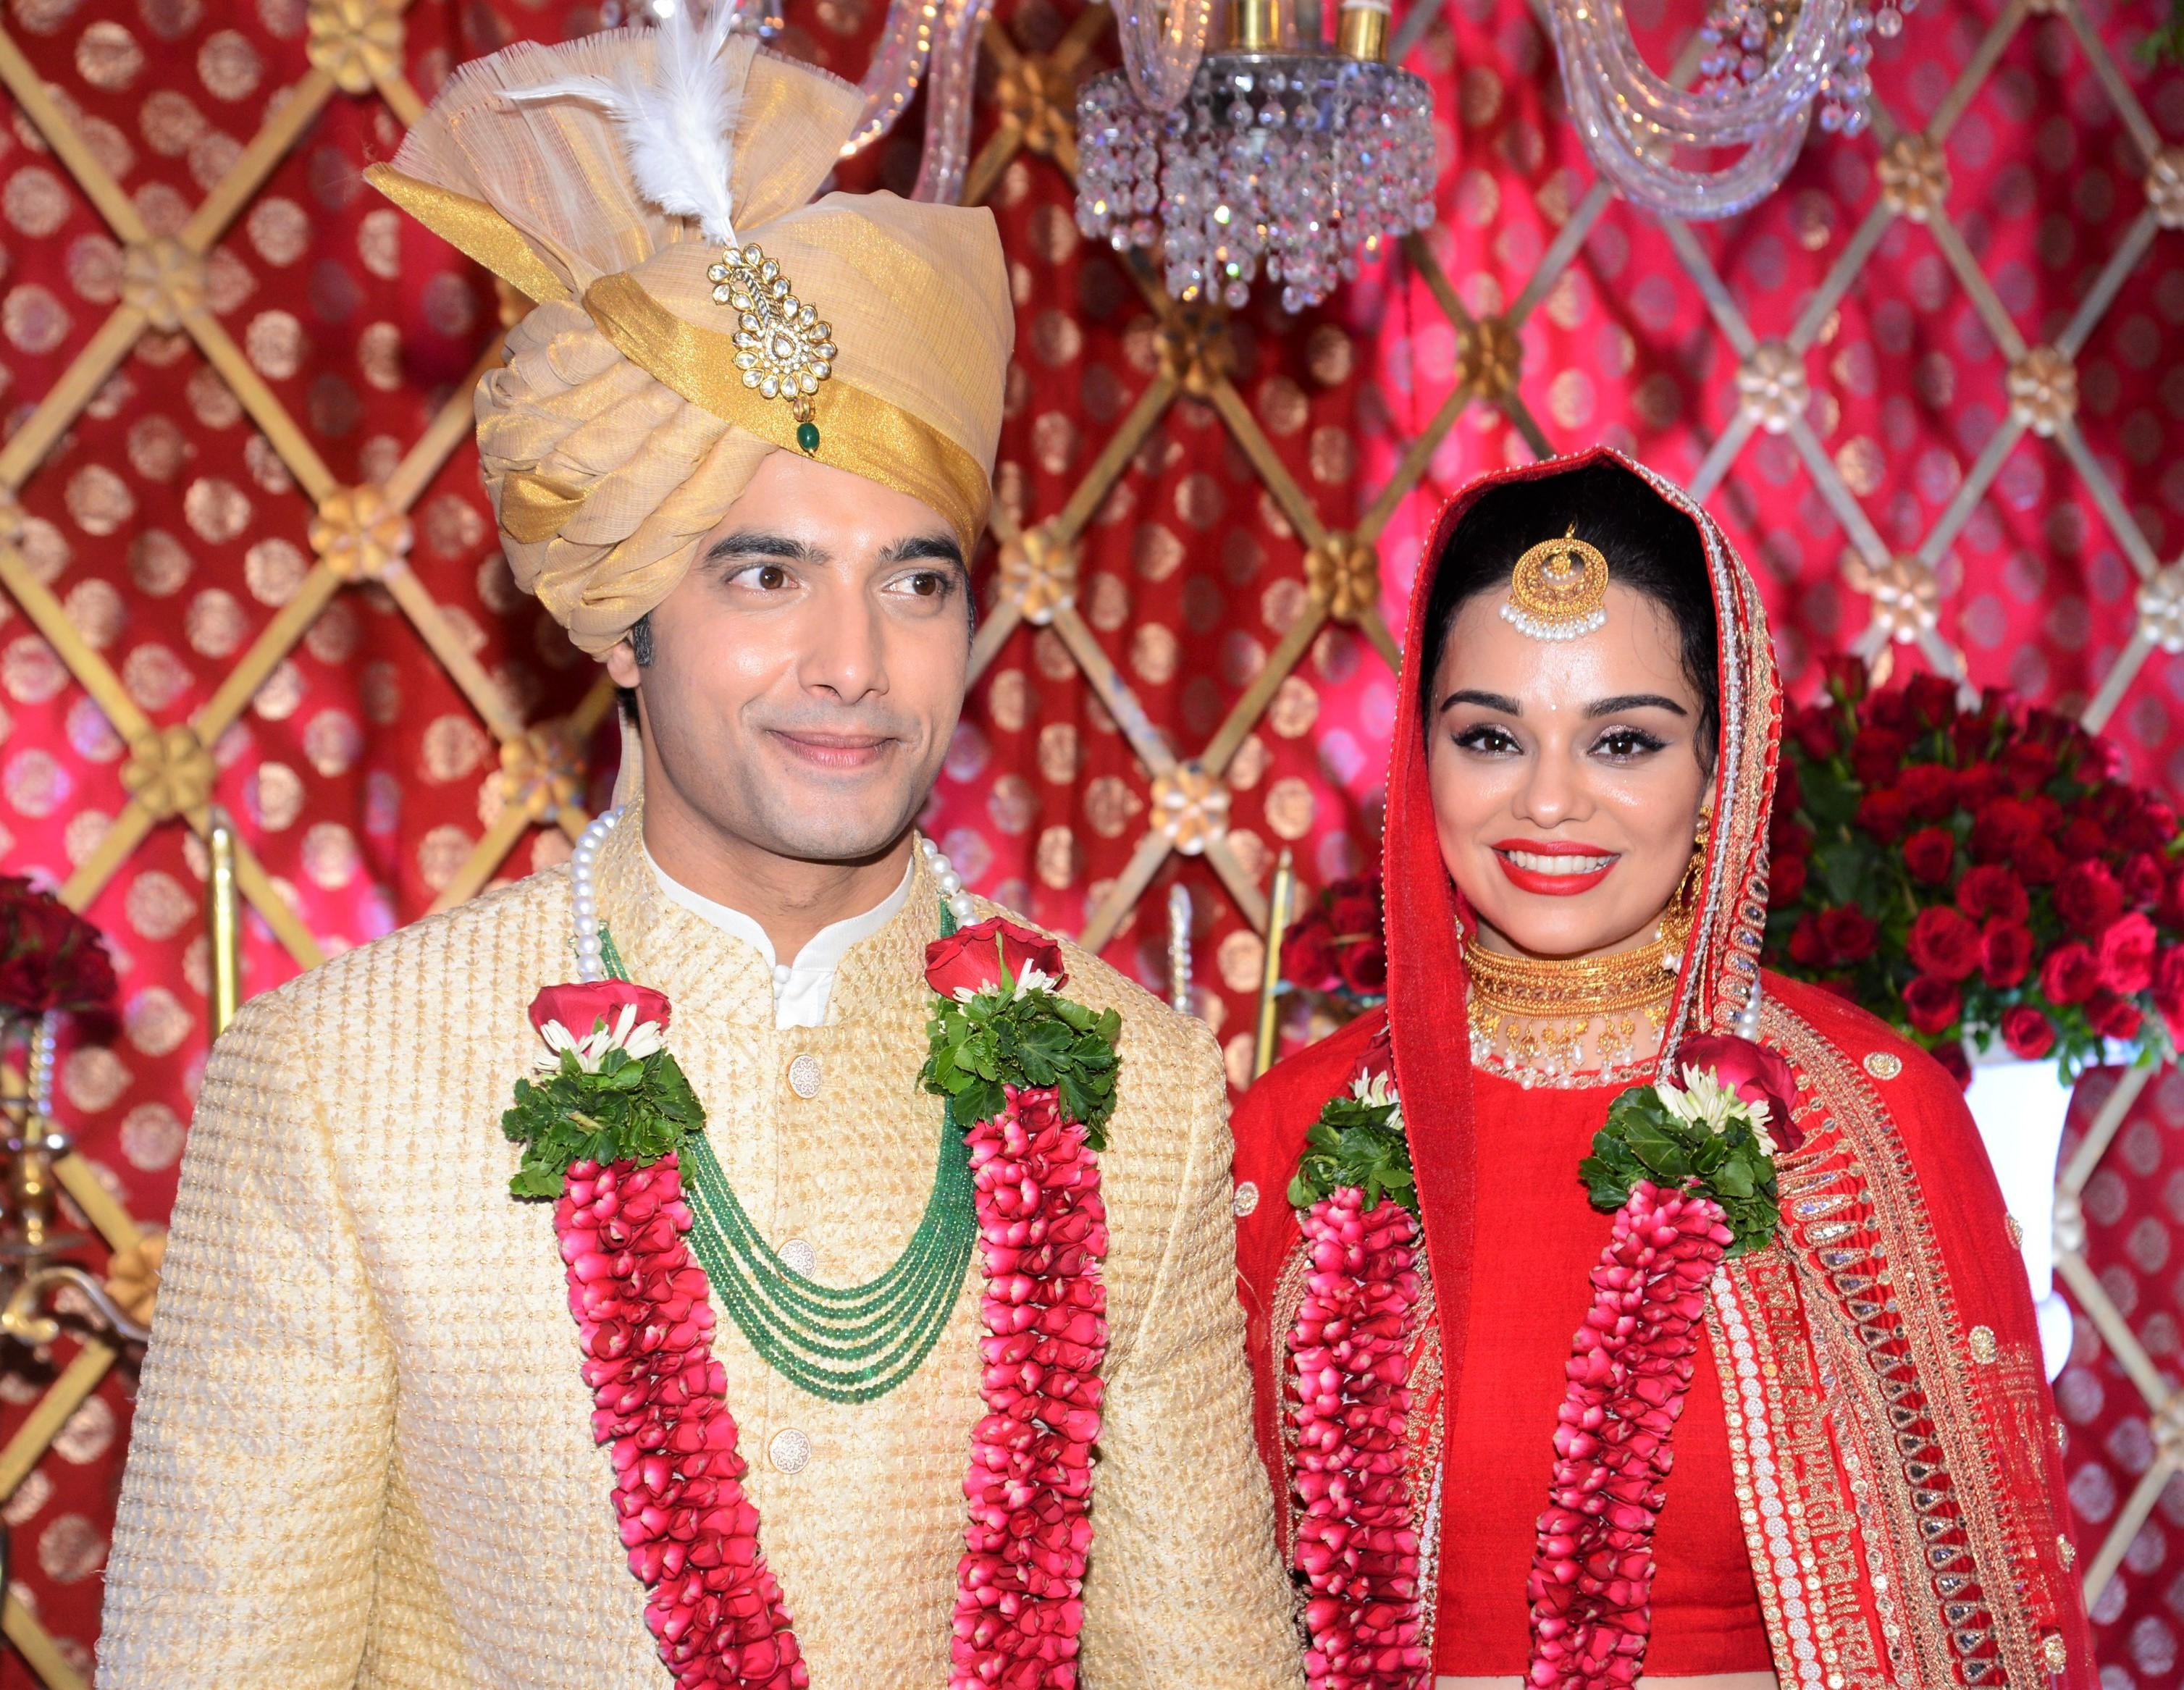 Sharad Malhotra Ties The Knot With Designer Ripci Bhatia!